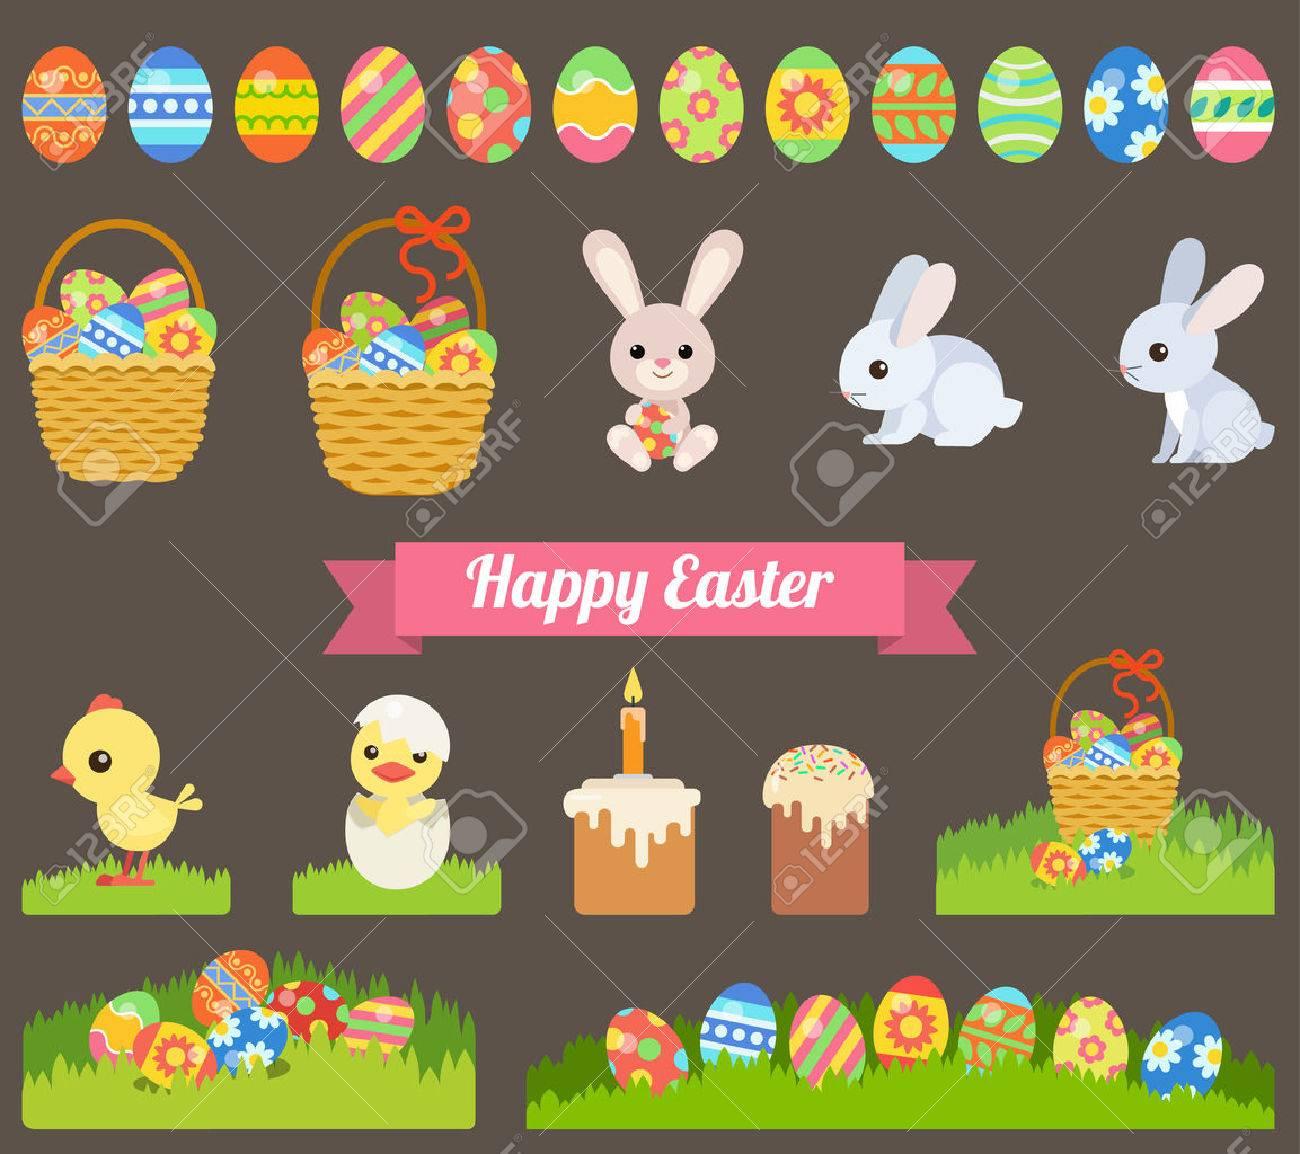 Easter holiday flat style icon set - 54532778